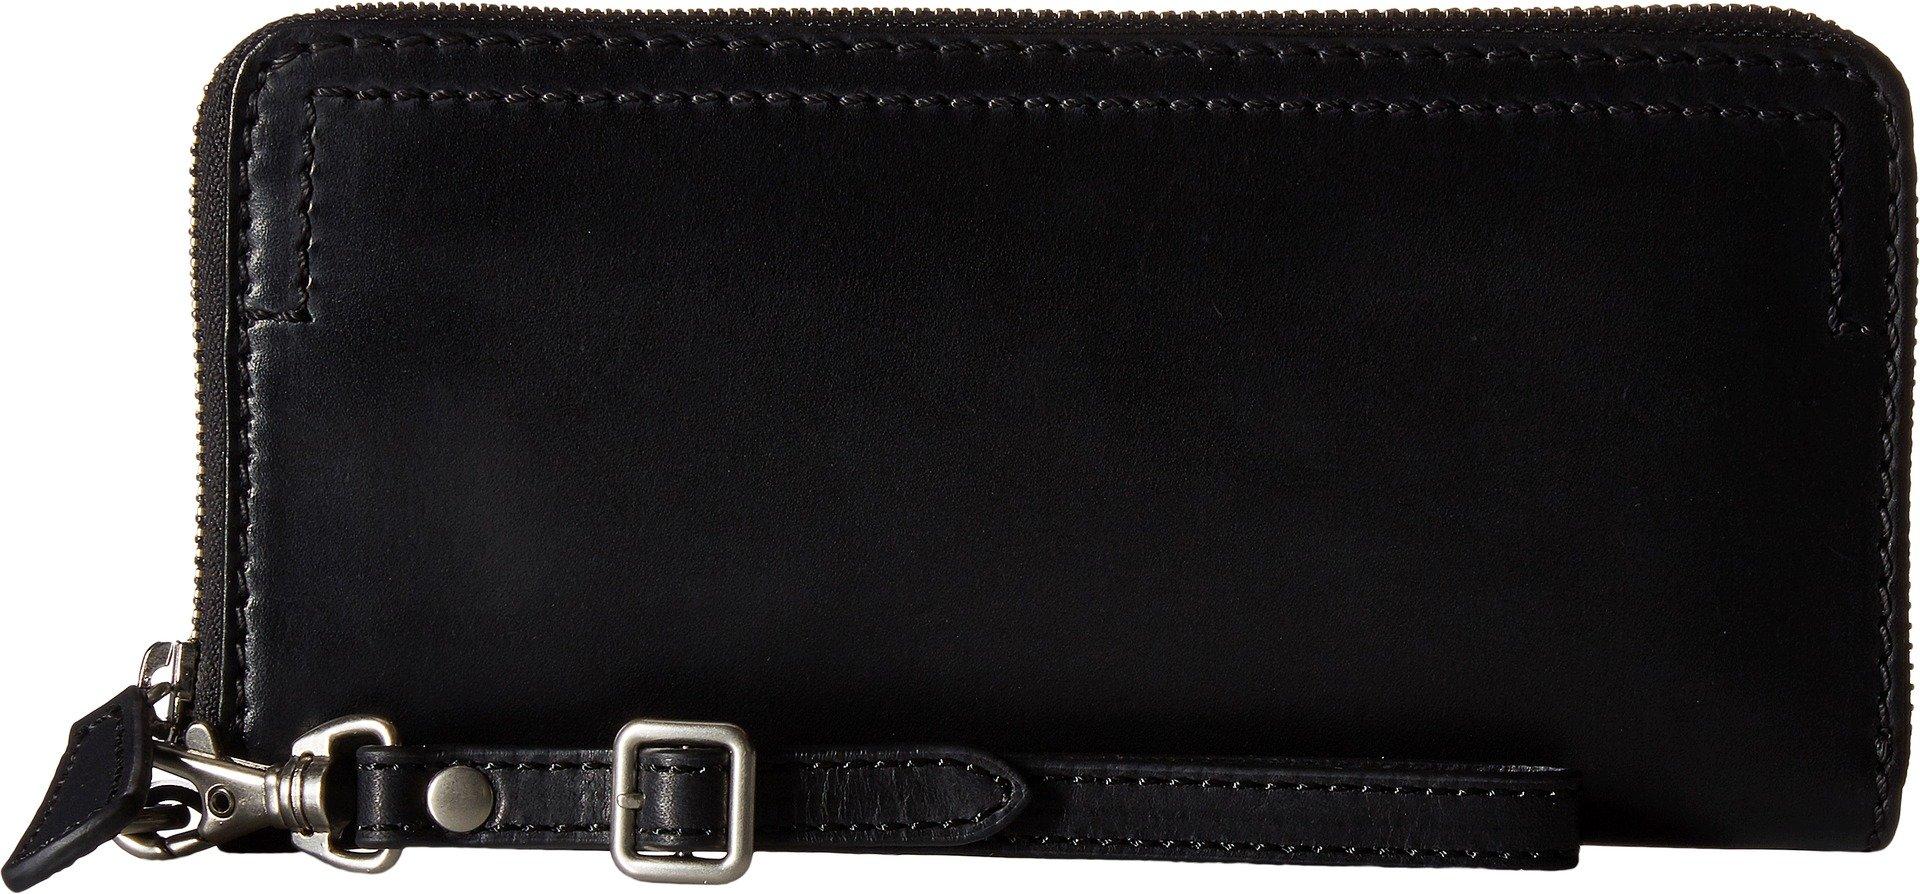 Frye Women's Casey Wristlet Black Handbag